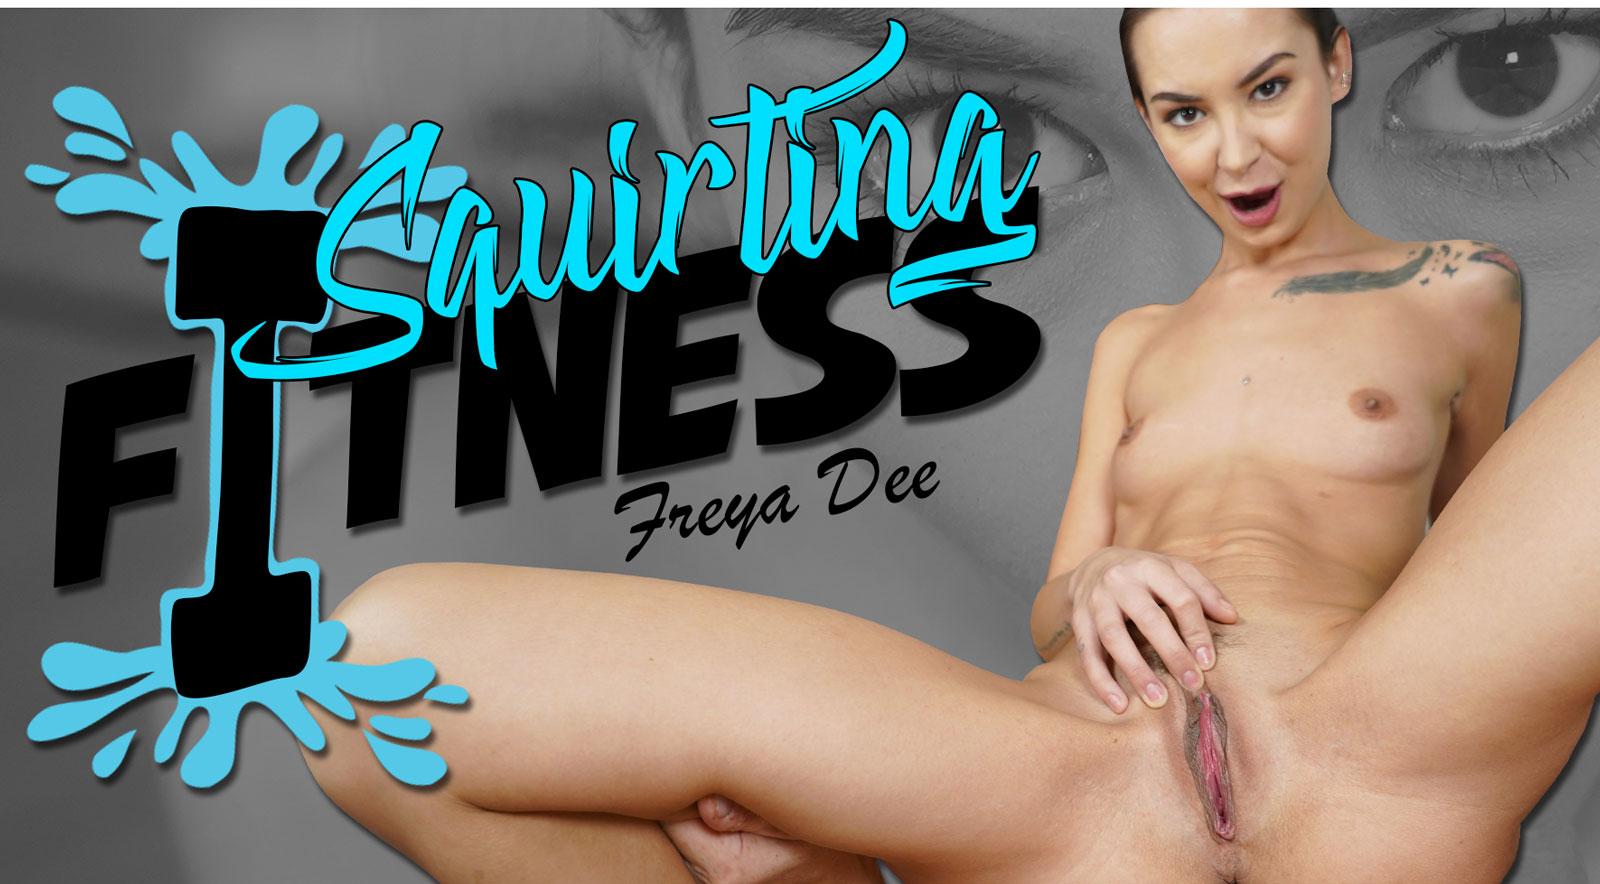 Squirting Fitness Freya Dee